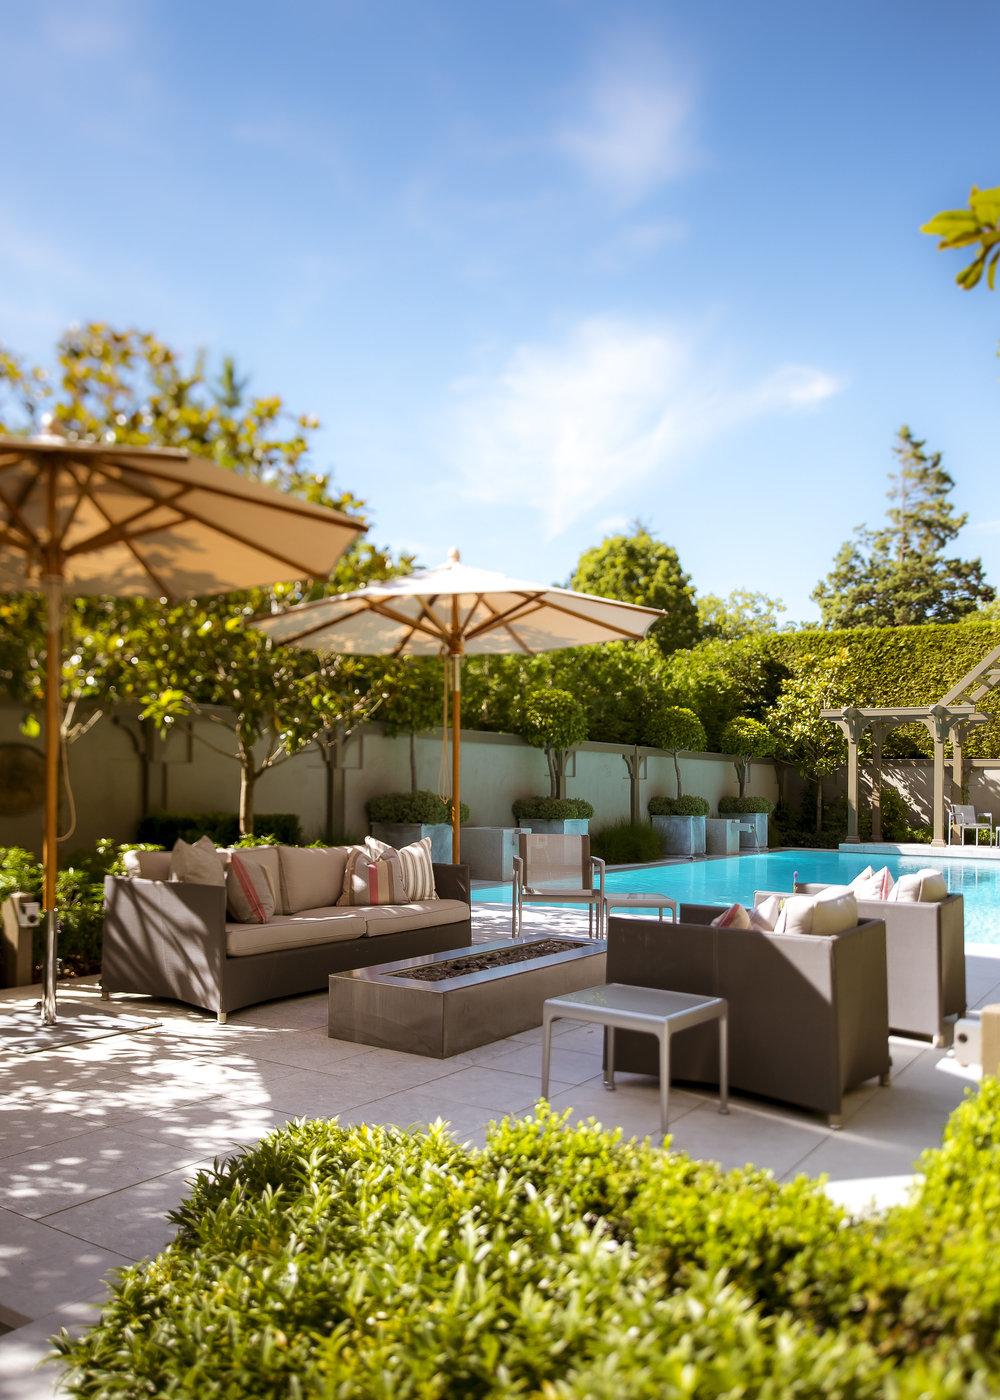 Poolside seating area by Paul Sangha